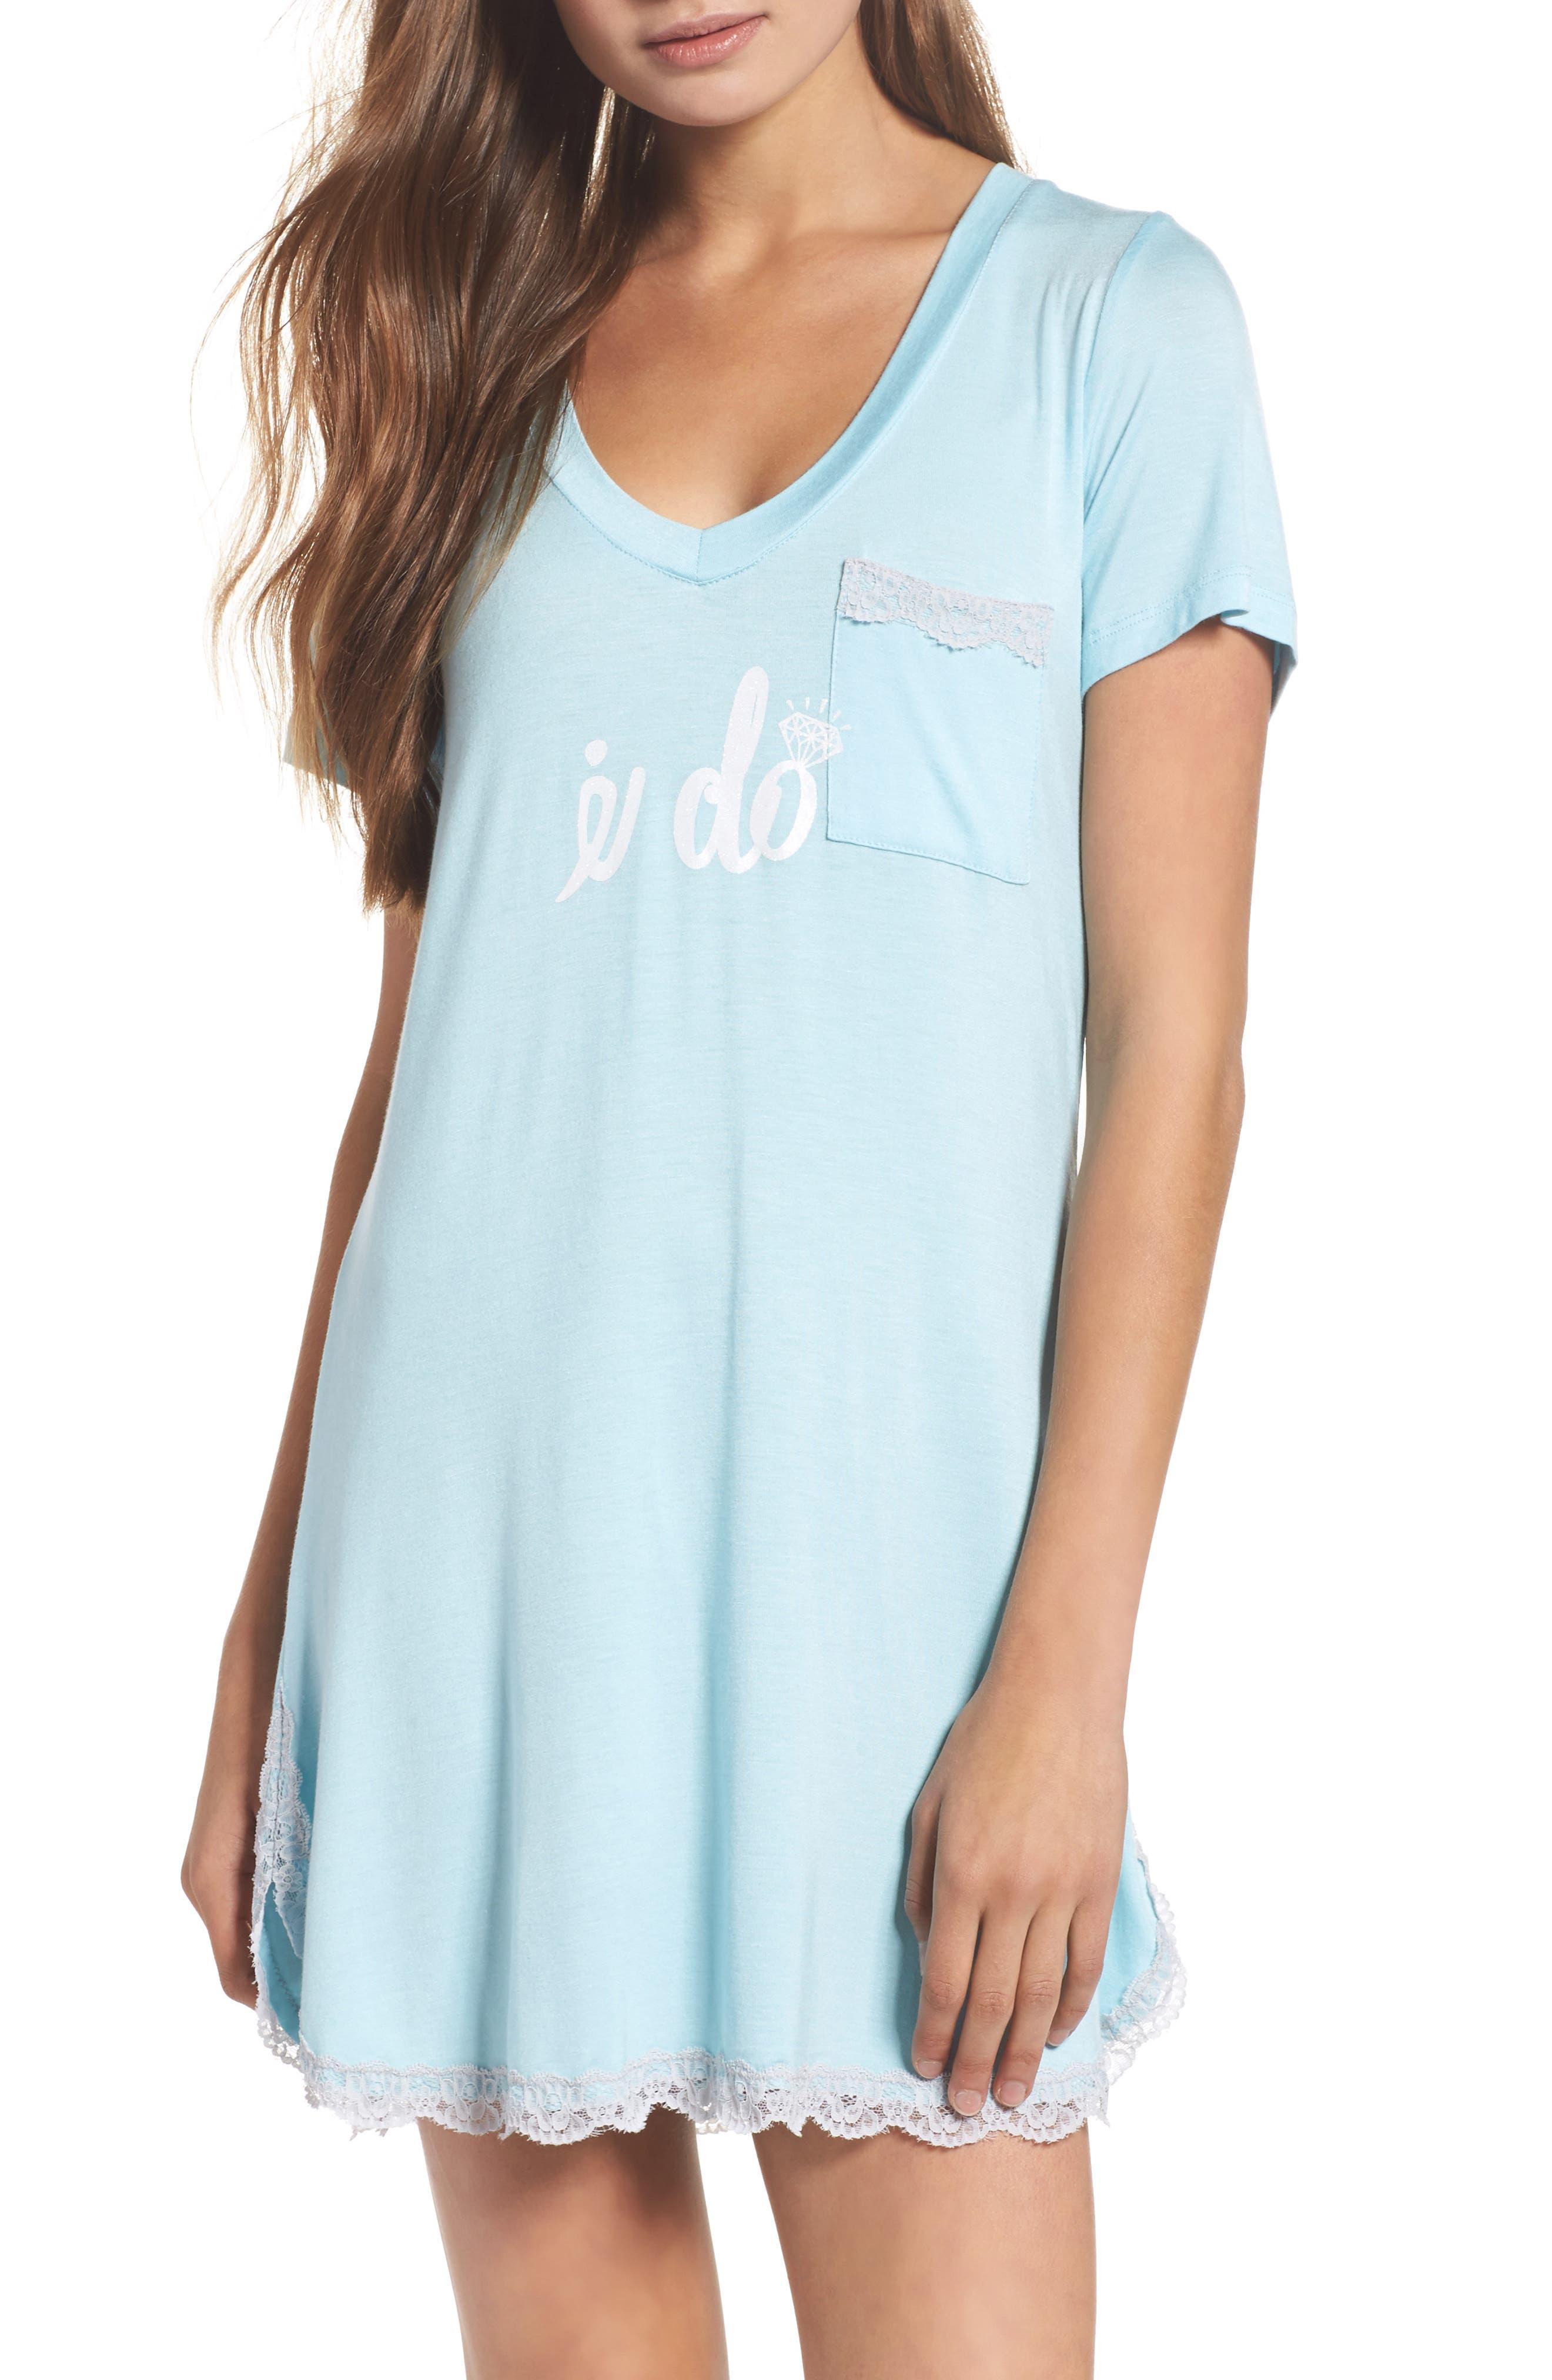 HONEYDEW INTIMATES 'All American' Sleep Shirt, Main, color, I DO